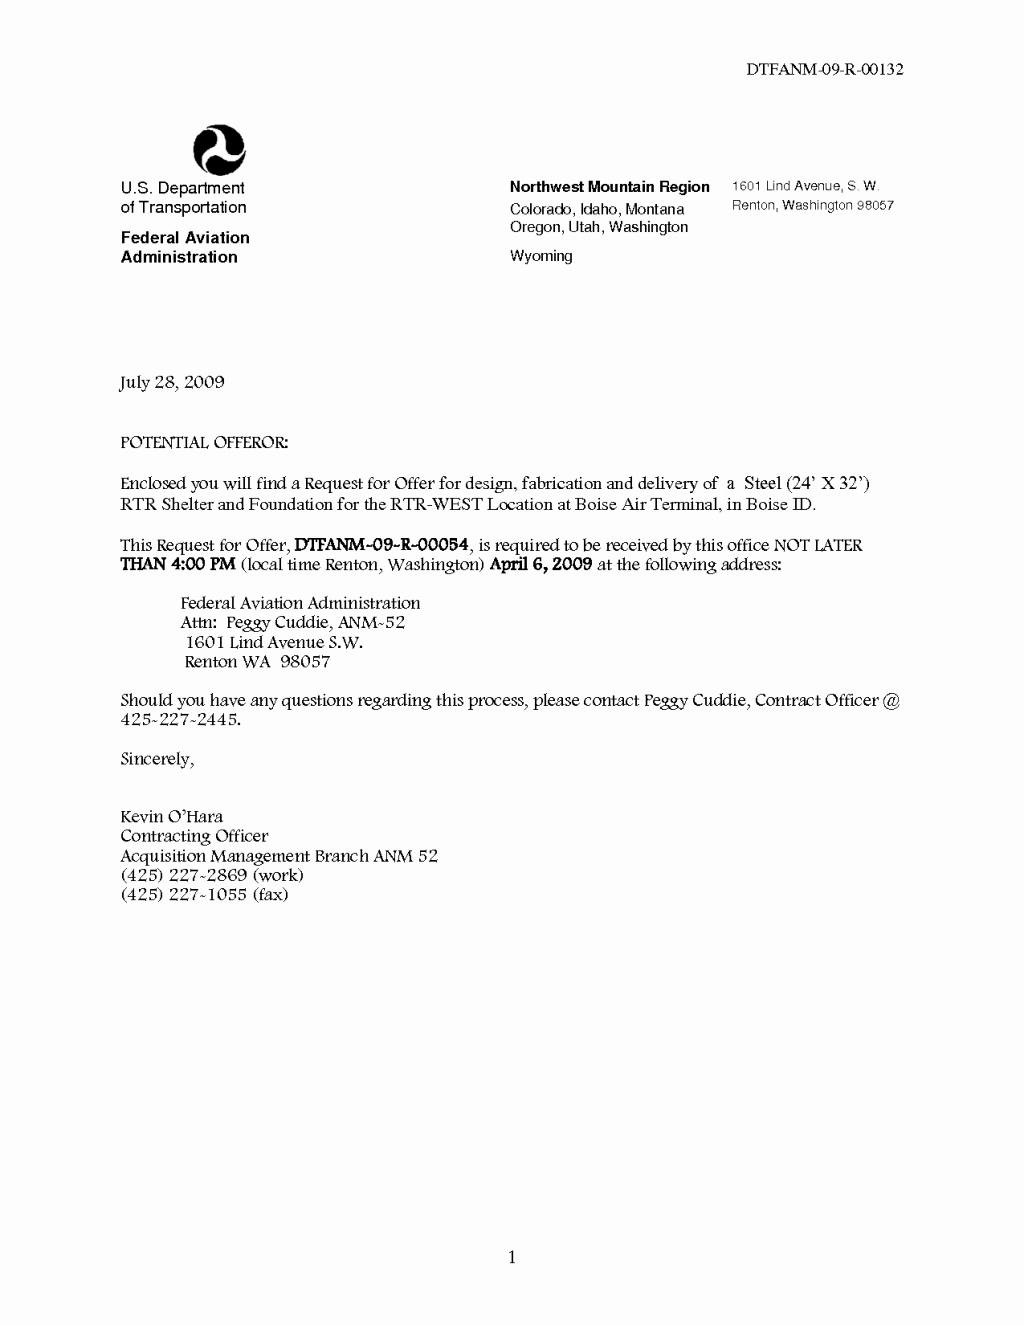 Vendor Recommendation Letter Sample Inspirational Reference Letter From Employer for Rental Shopgrat Example